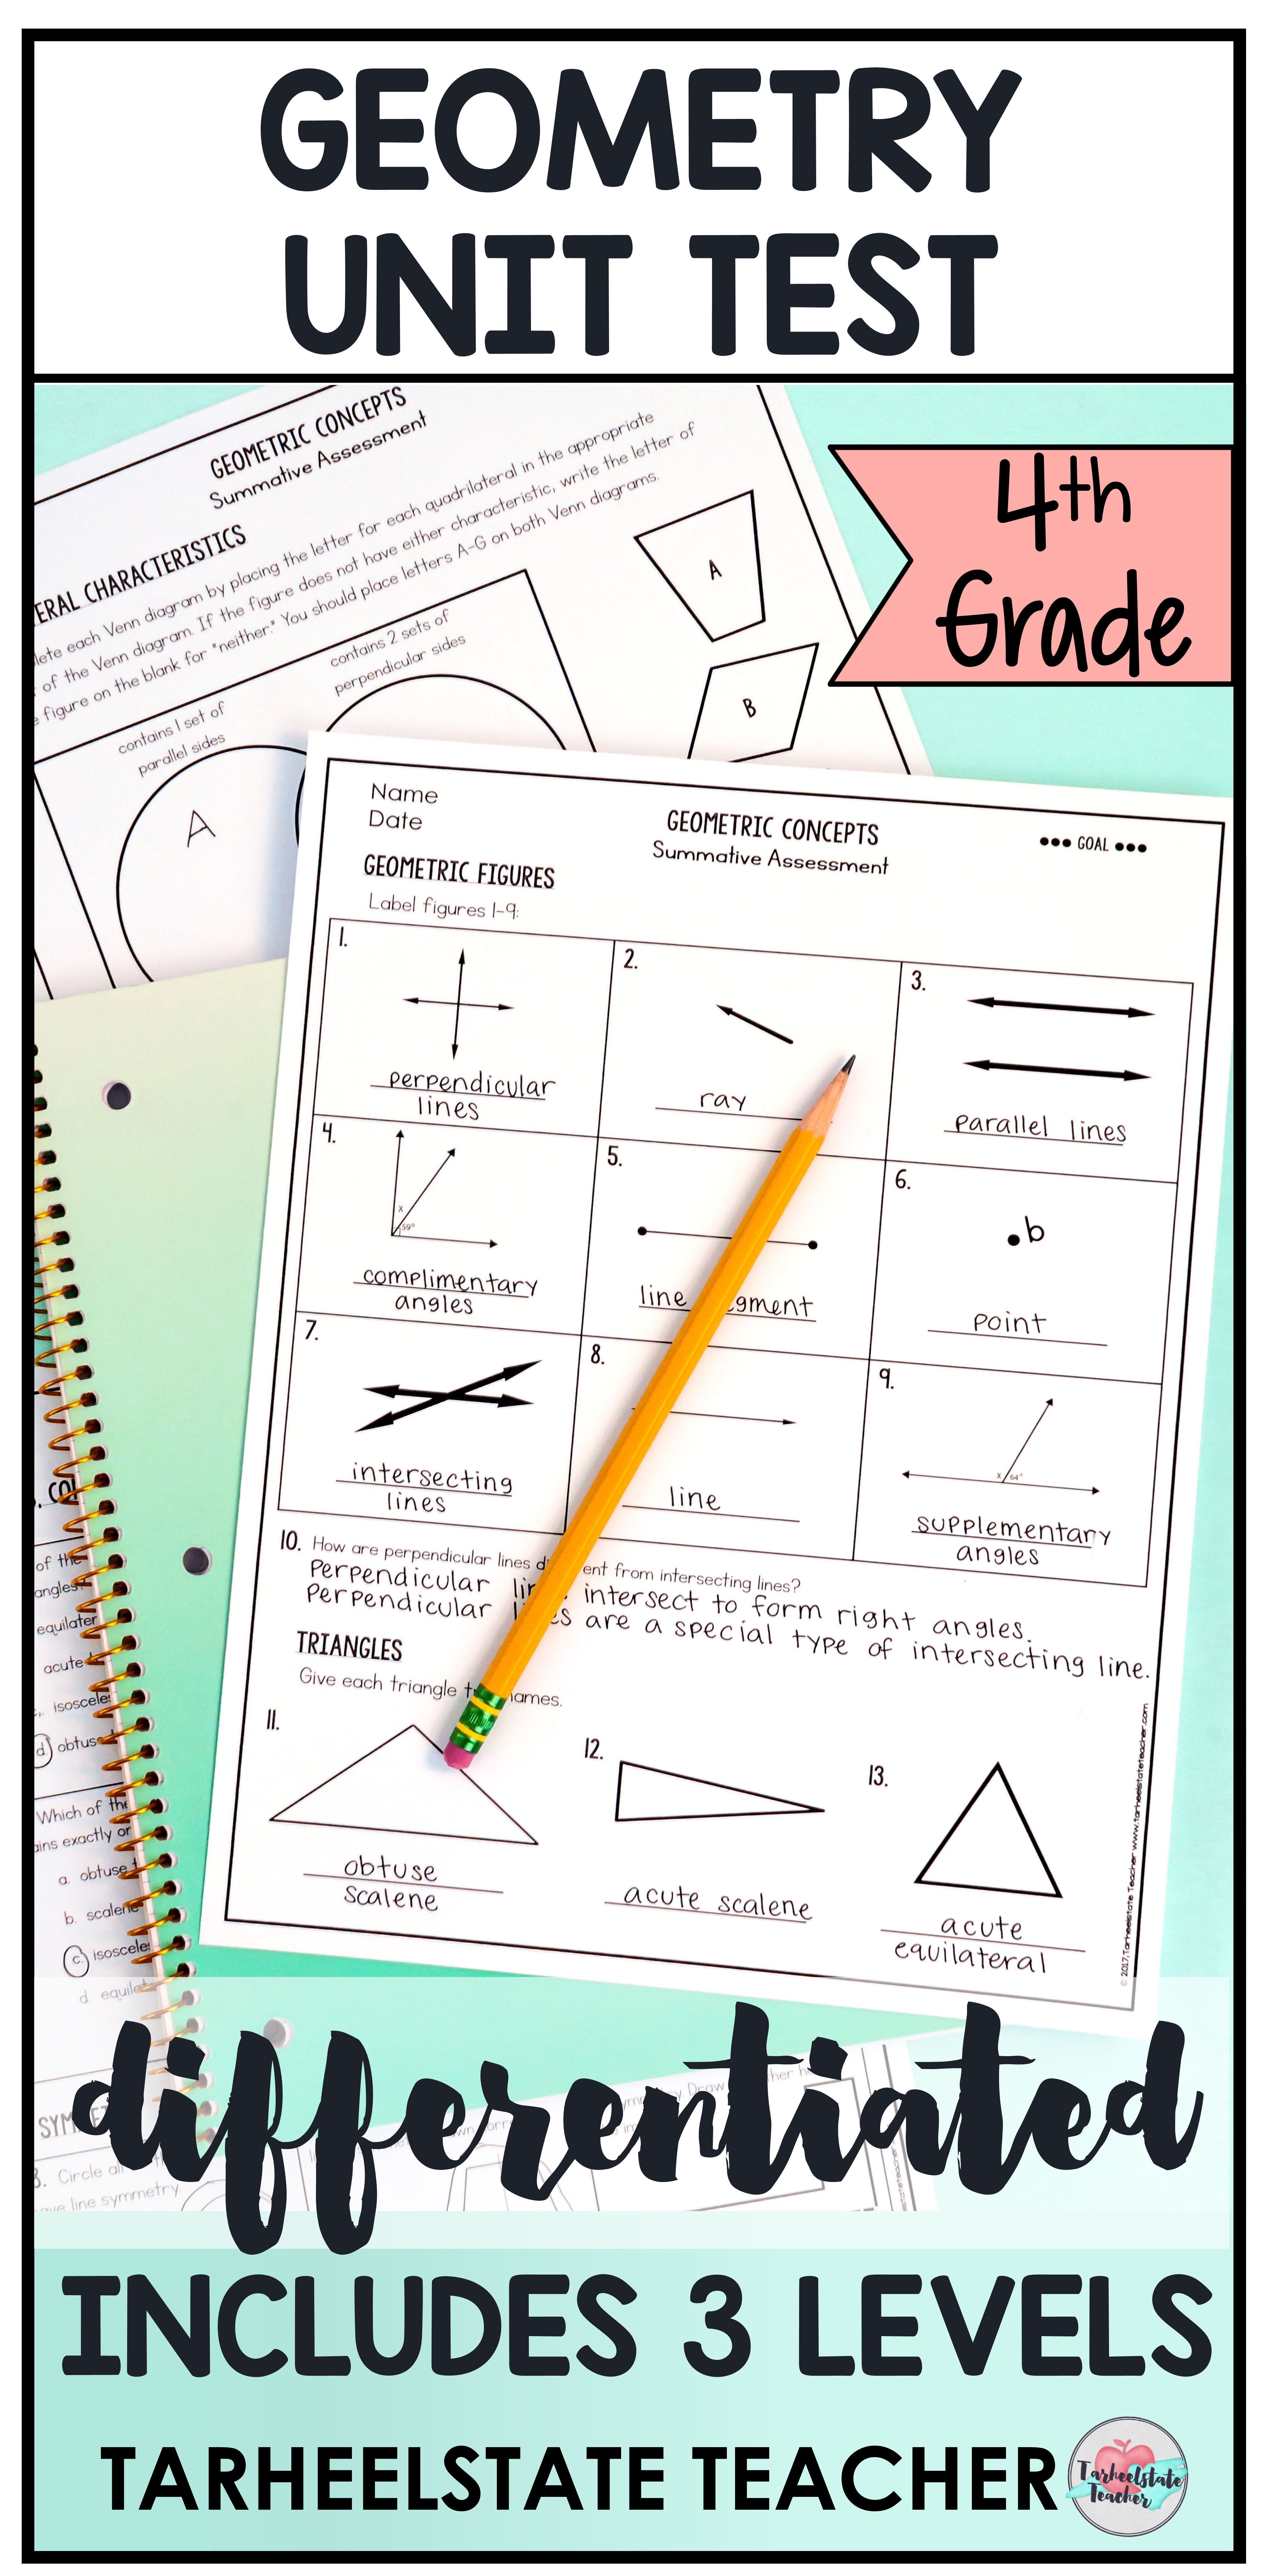 medium resolution of Pin on Tarheelstate Teacher Resources